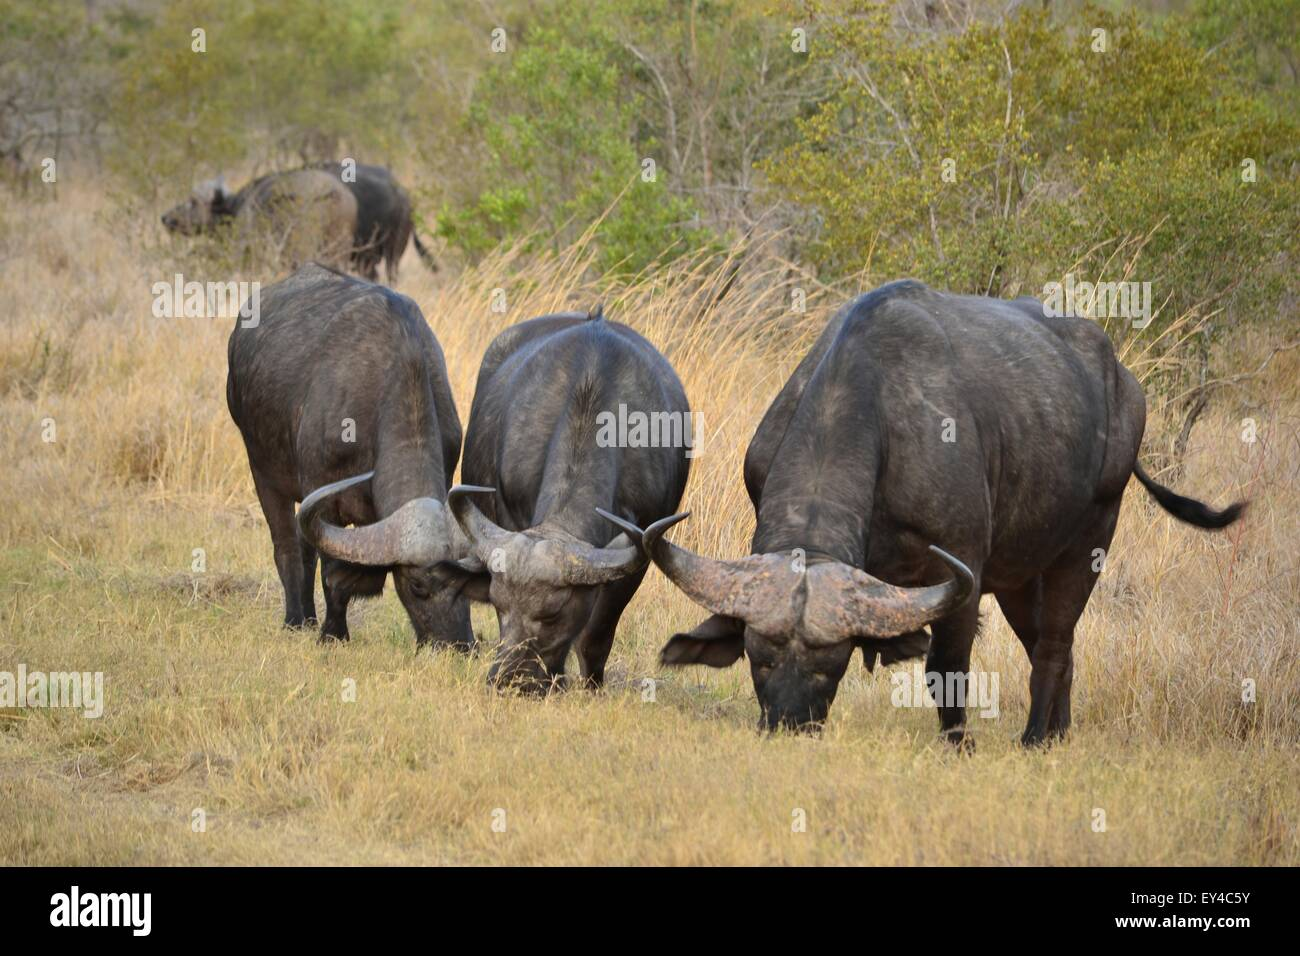 African Buffalos grazing. - Stock Image